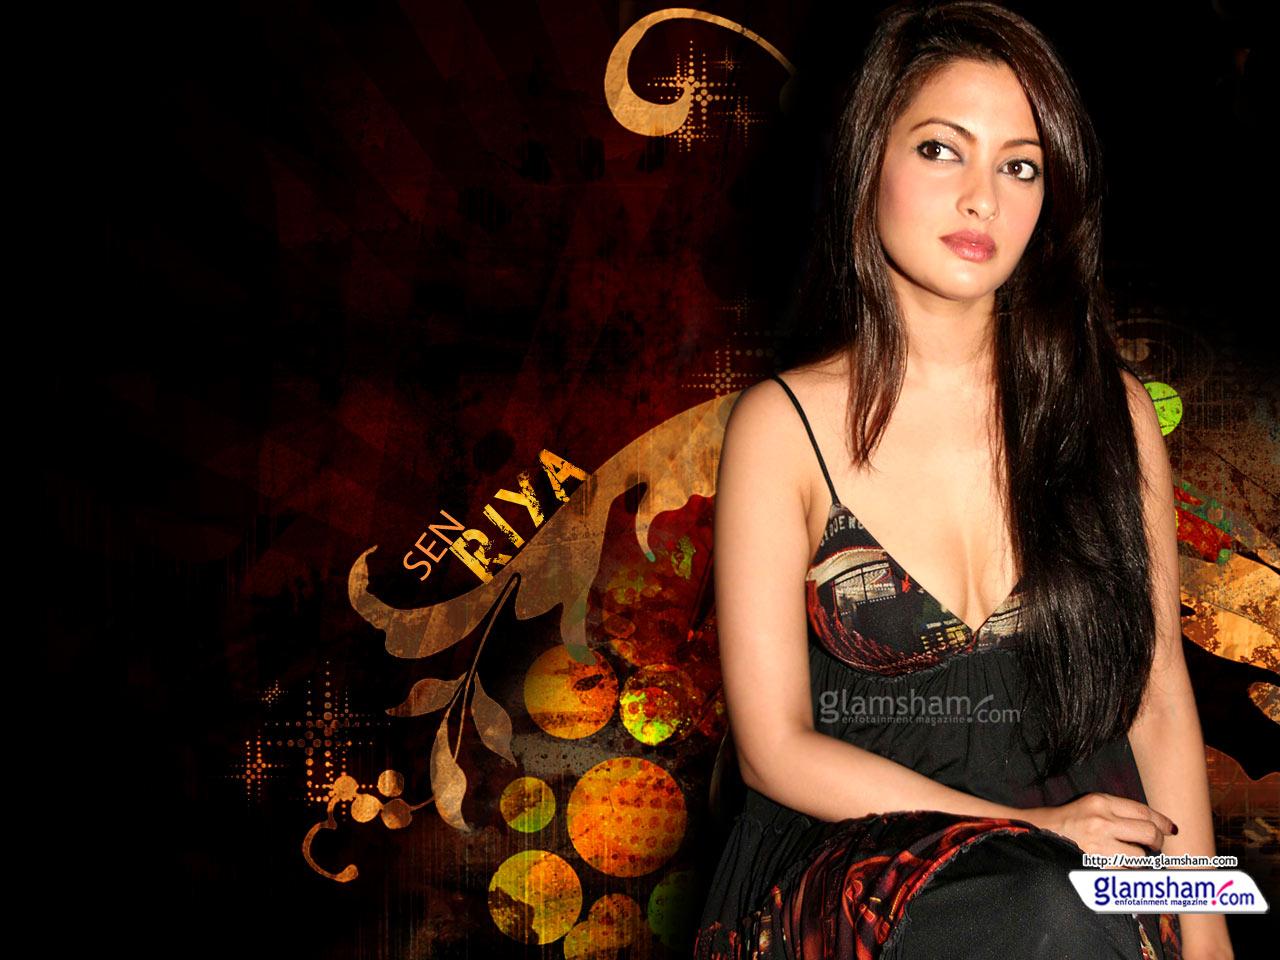 All Bollywood Girl Hd Wallpaper Hd Wallpaper Of Riya Sen Hd Wallpapers